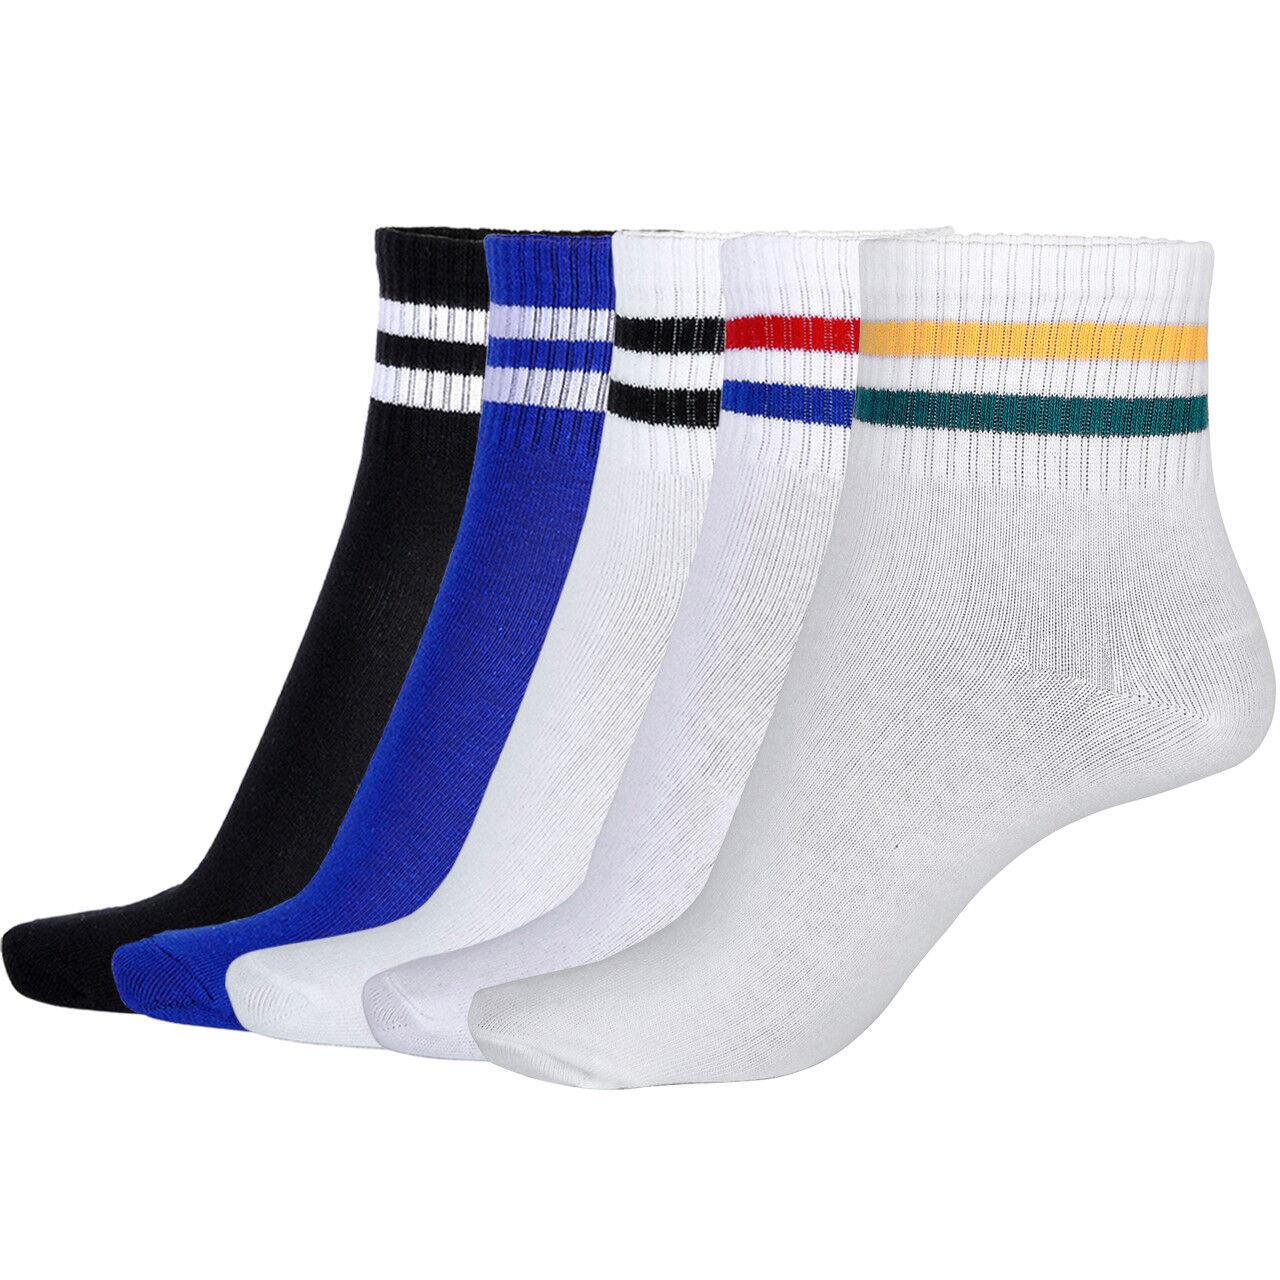 Paar Herren Damensocken Baumwollstrümpfe Bequem Sportsocken Socks Sneaker